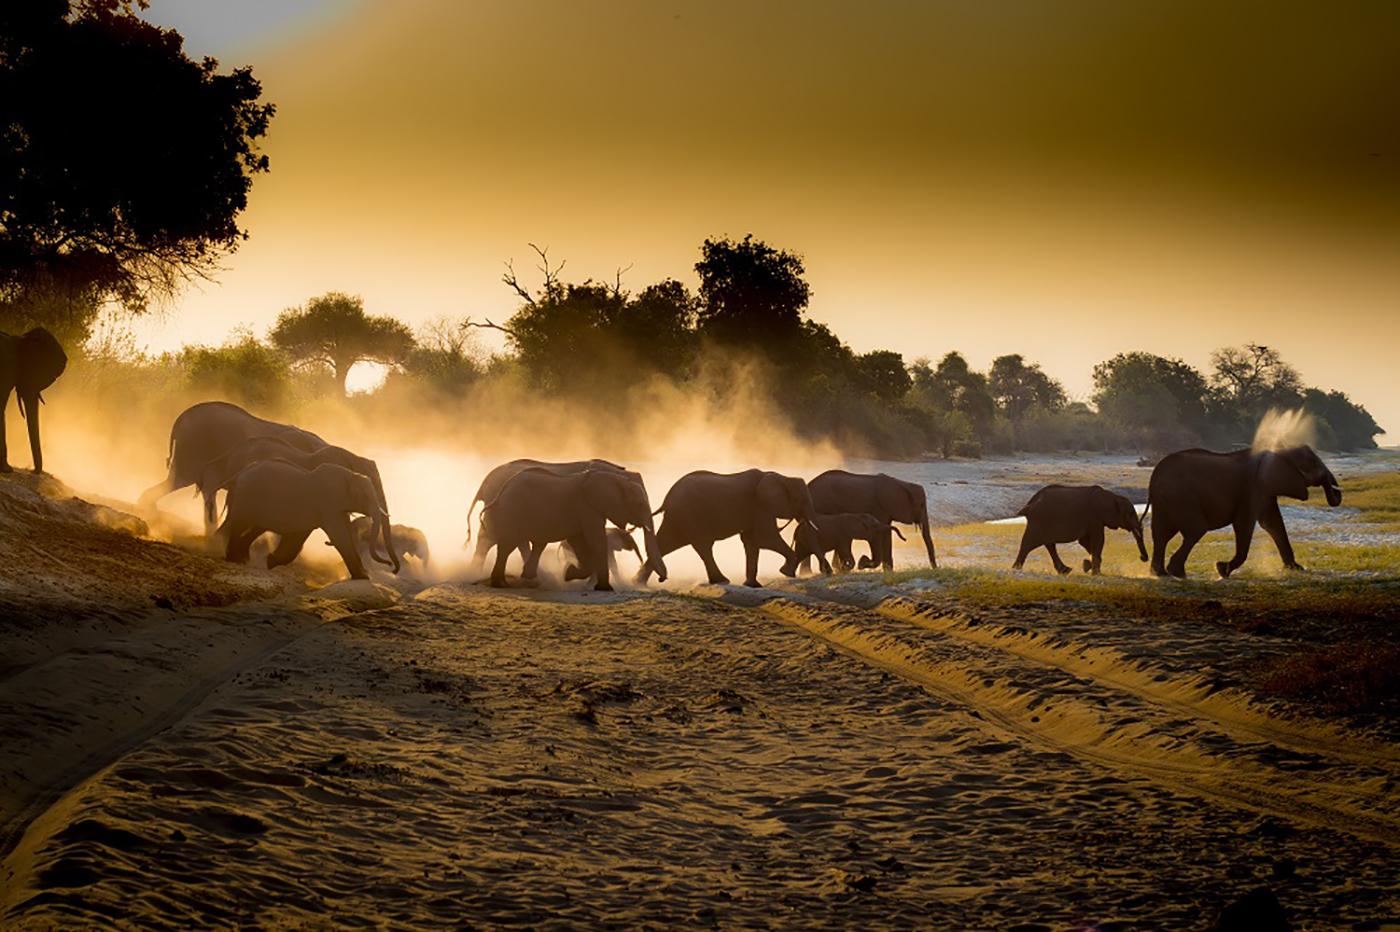 Elephants in Chobe National Park Sunrise